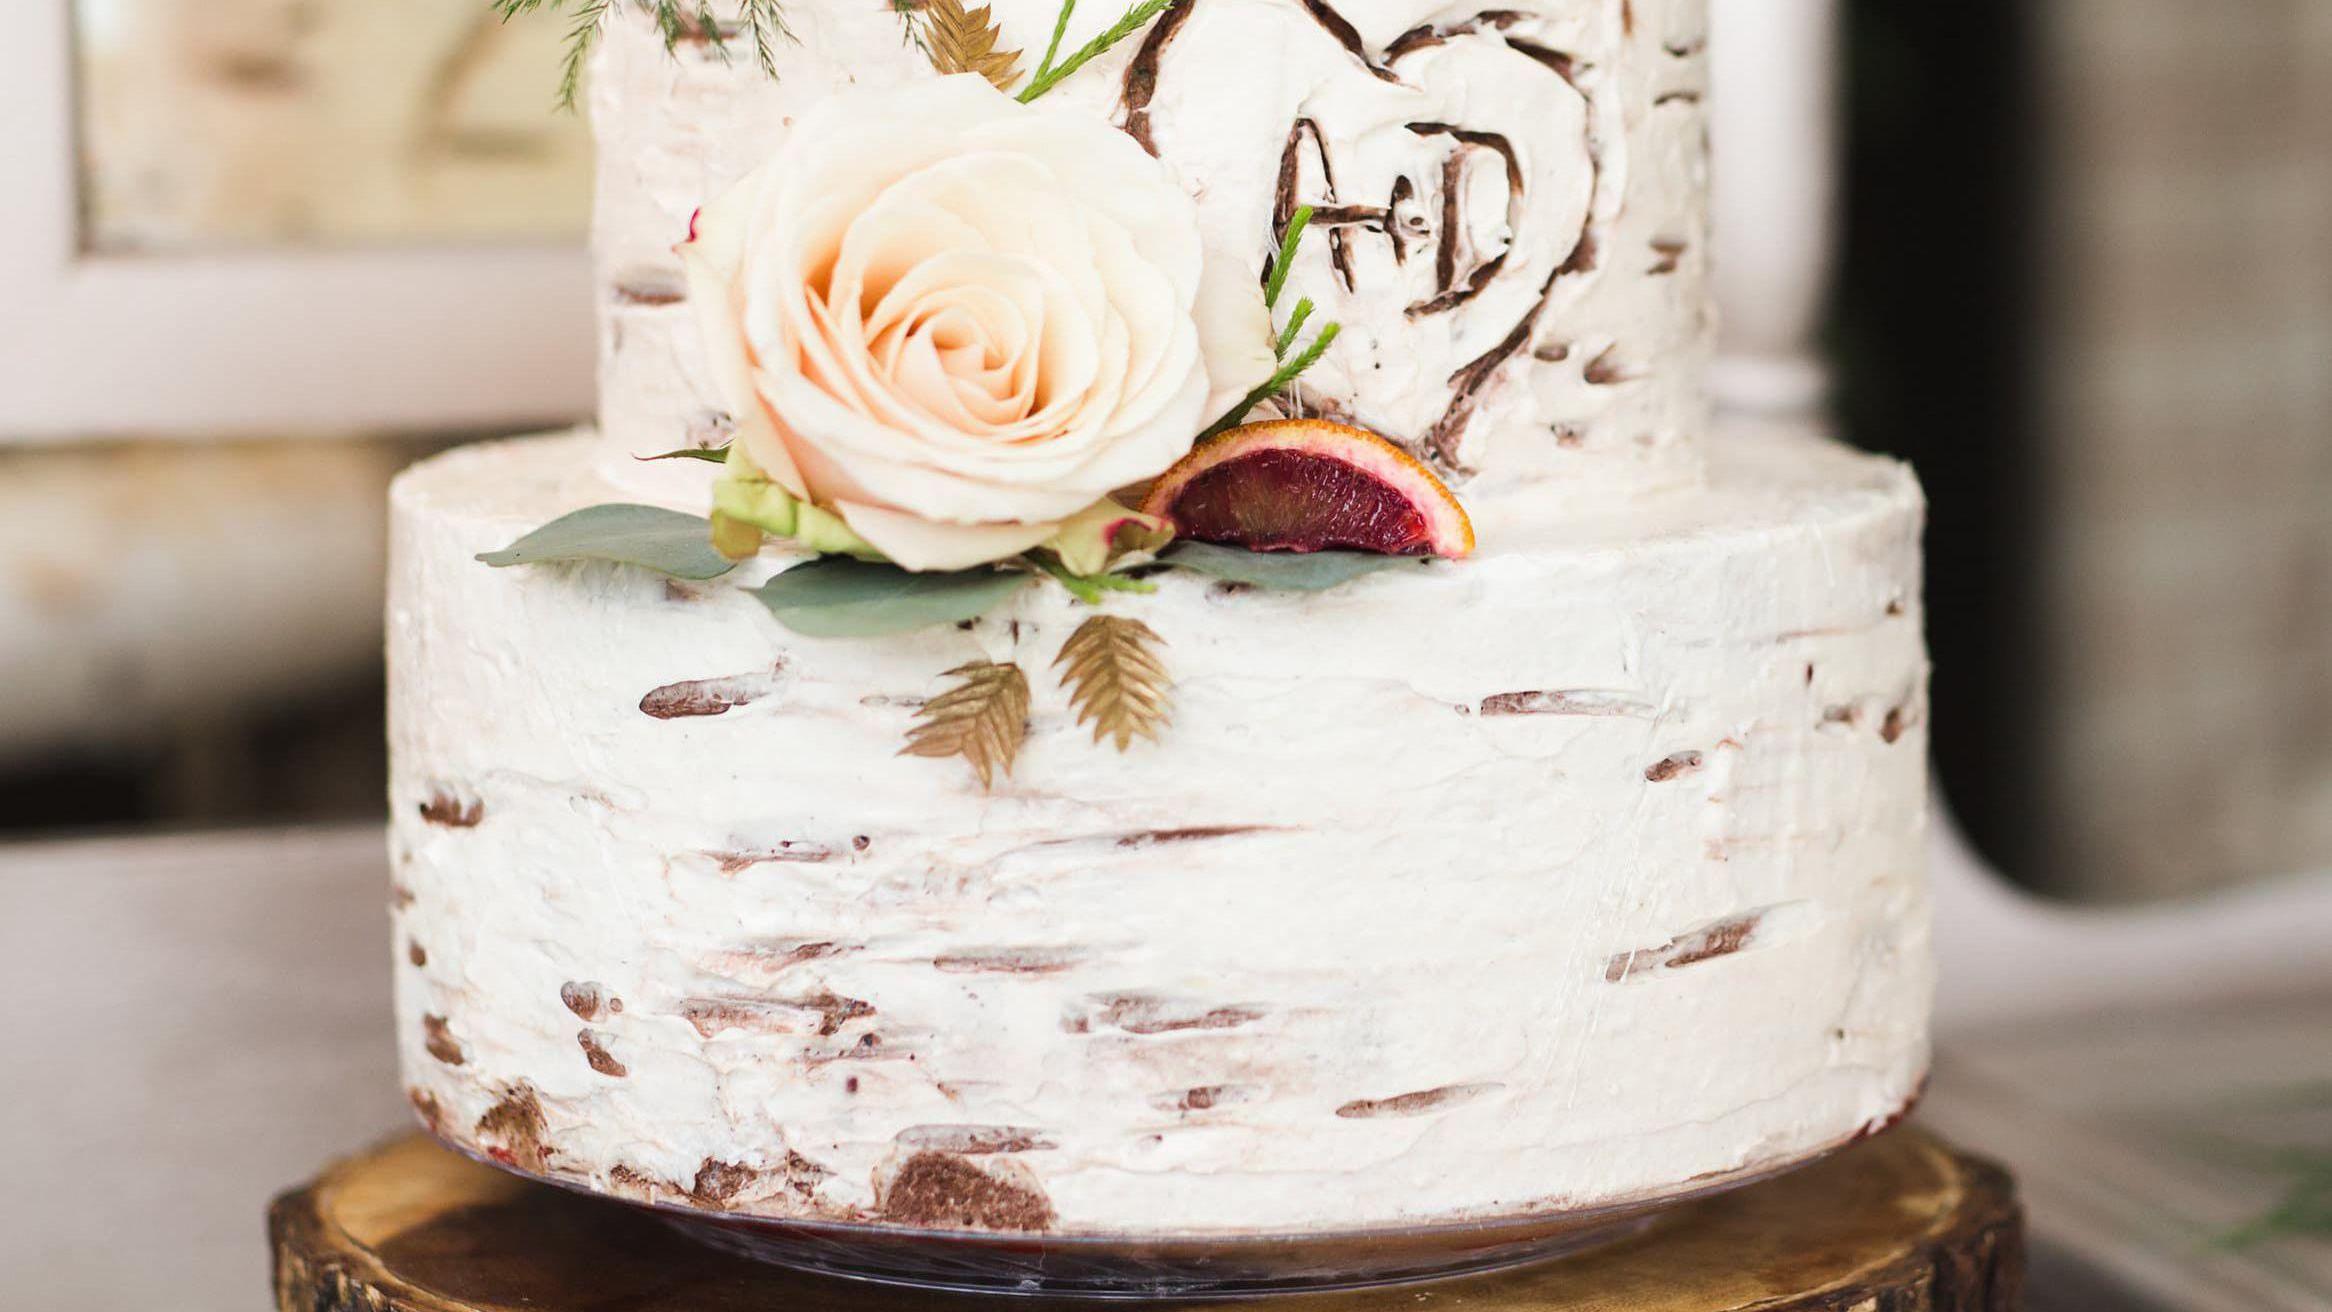 35 Rustic Wedding Cakes We Love